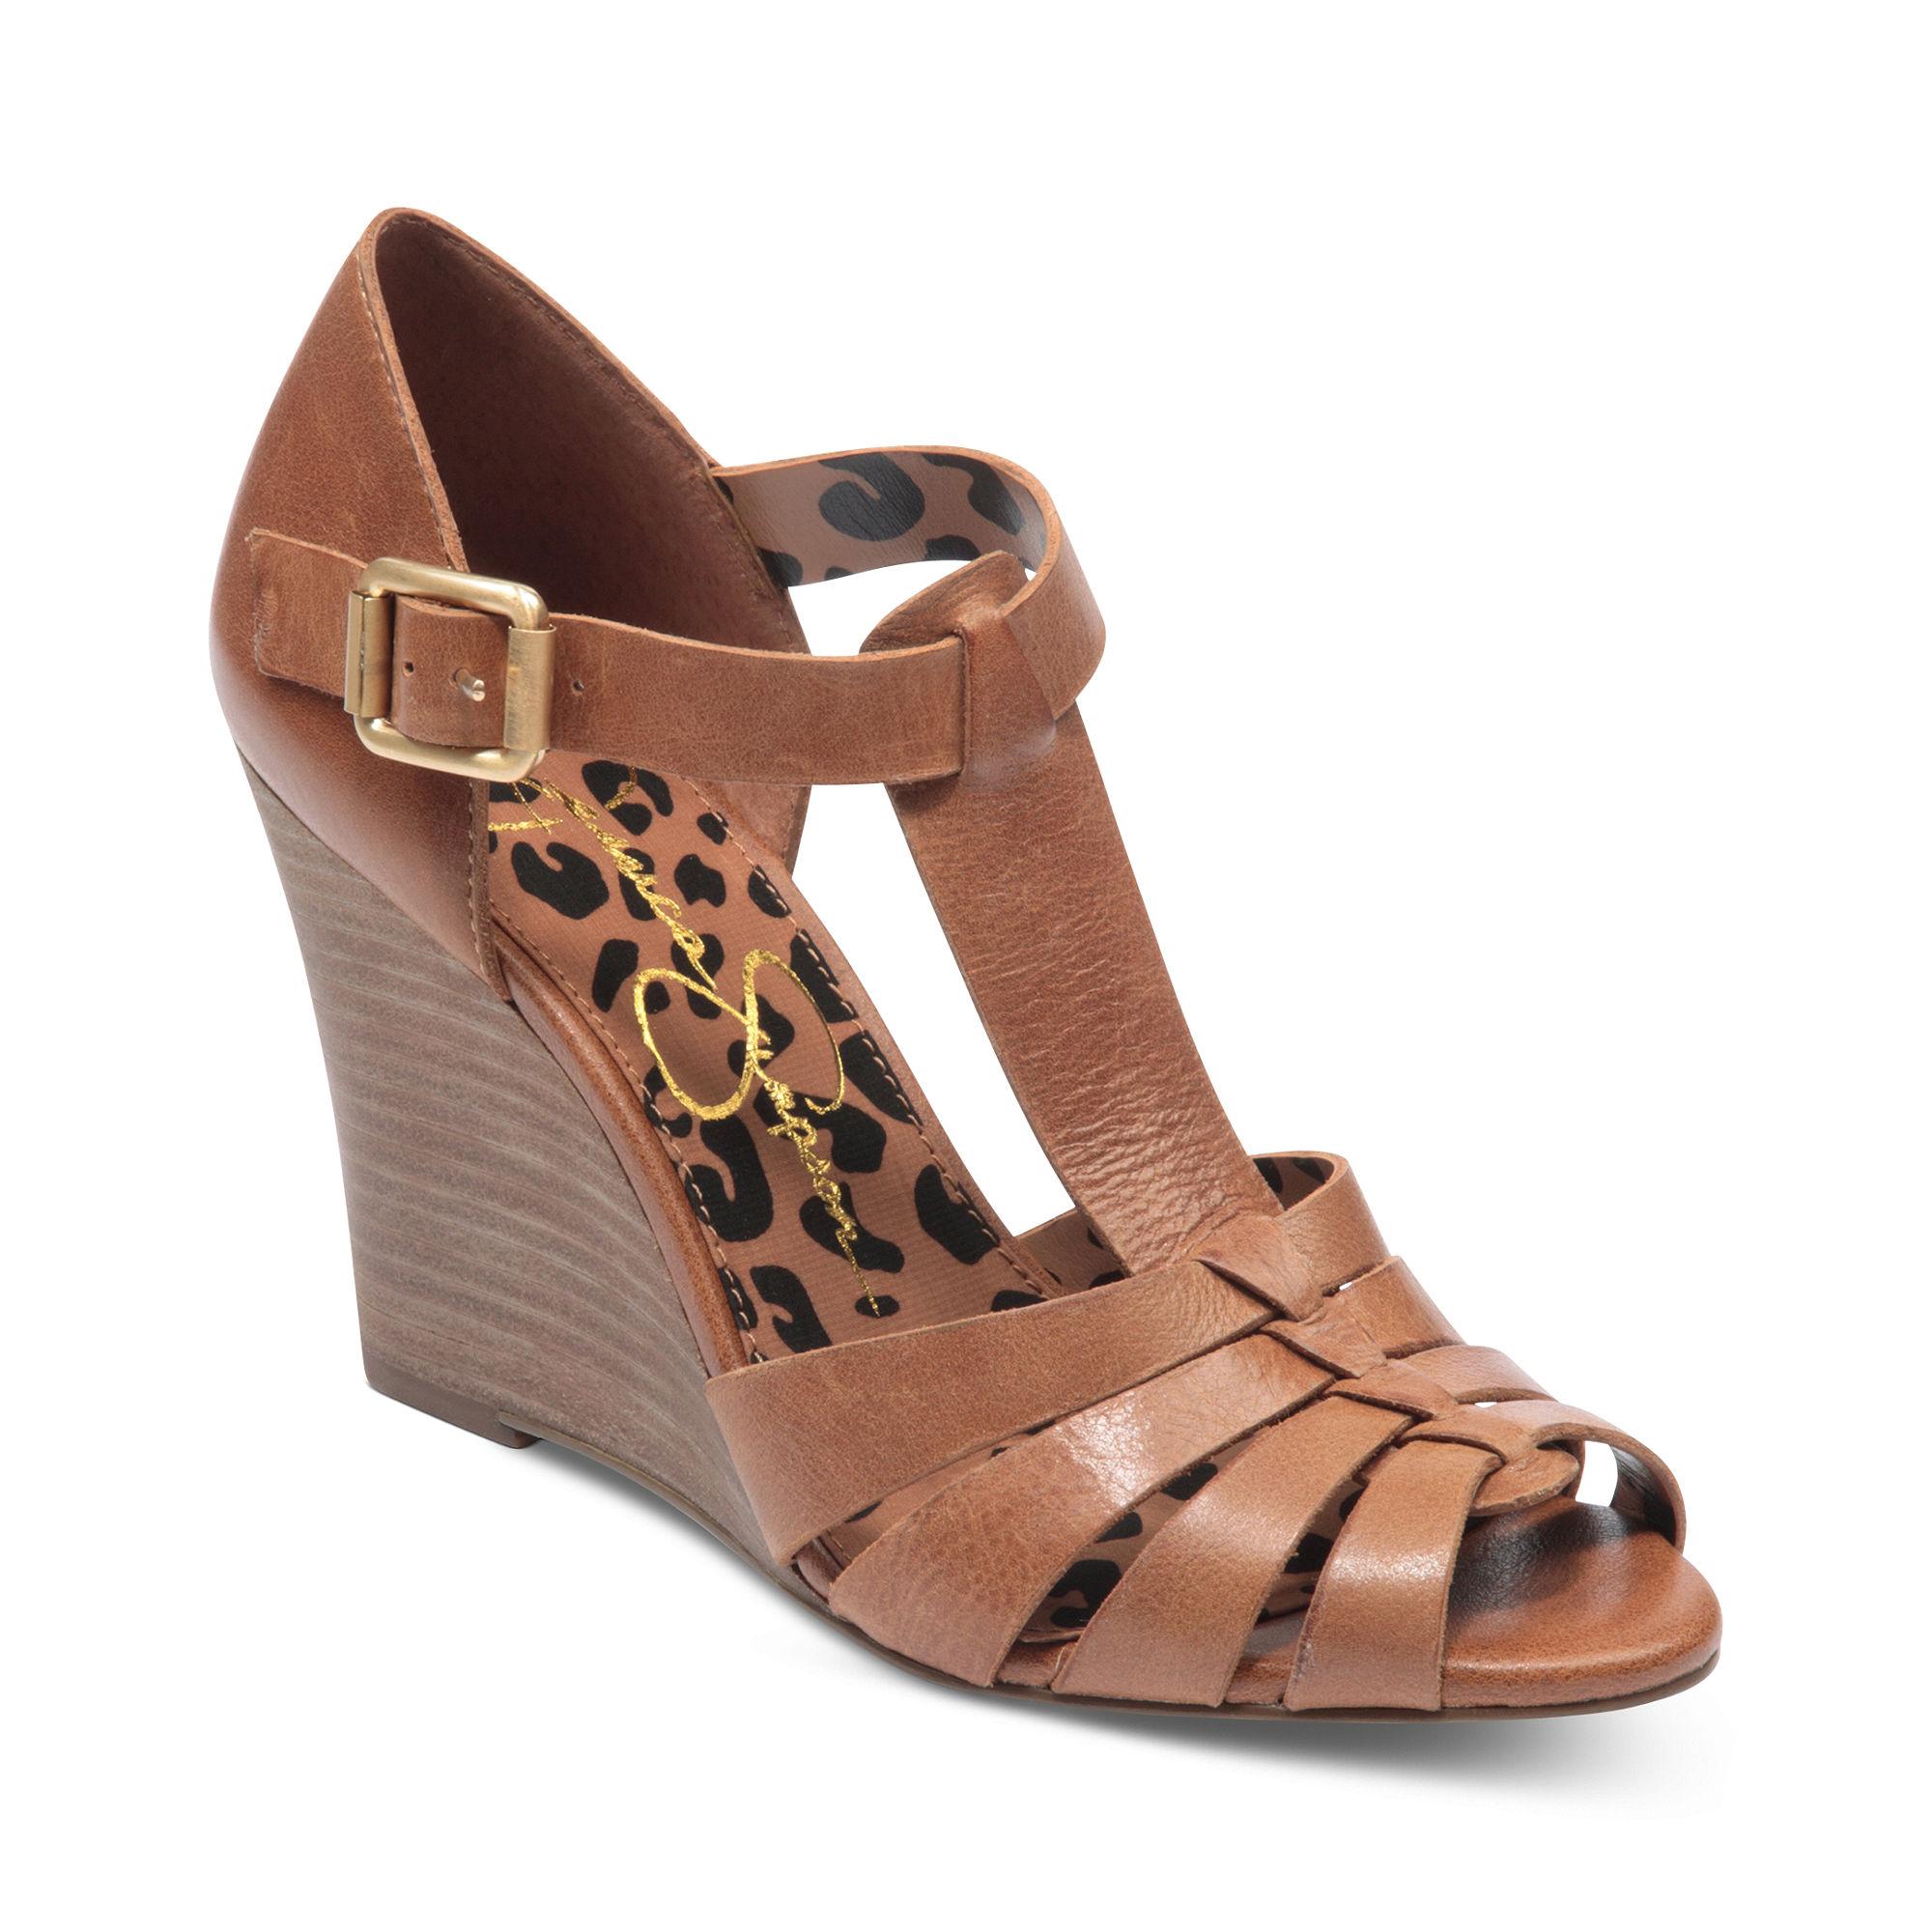 Lyst Jessica Simpson Rebi Tstrap Wedge Sandals In Brown